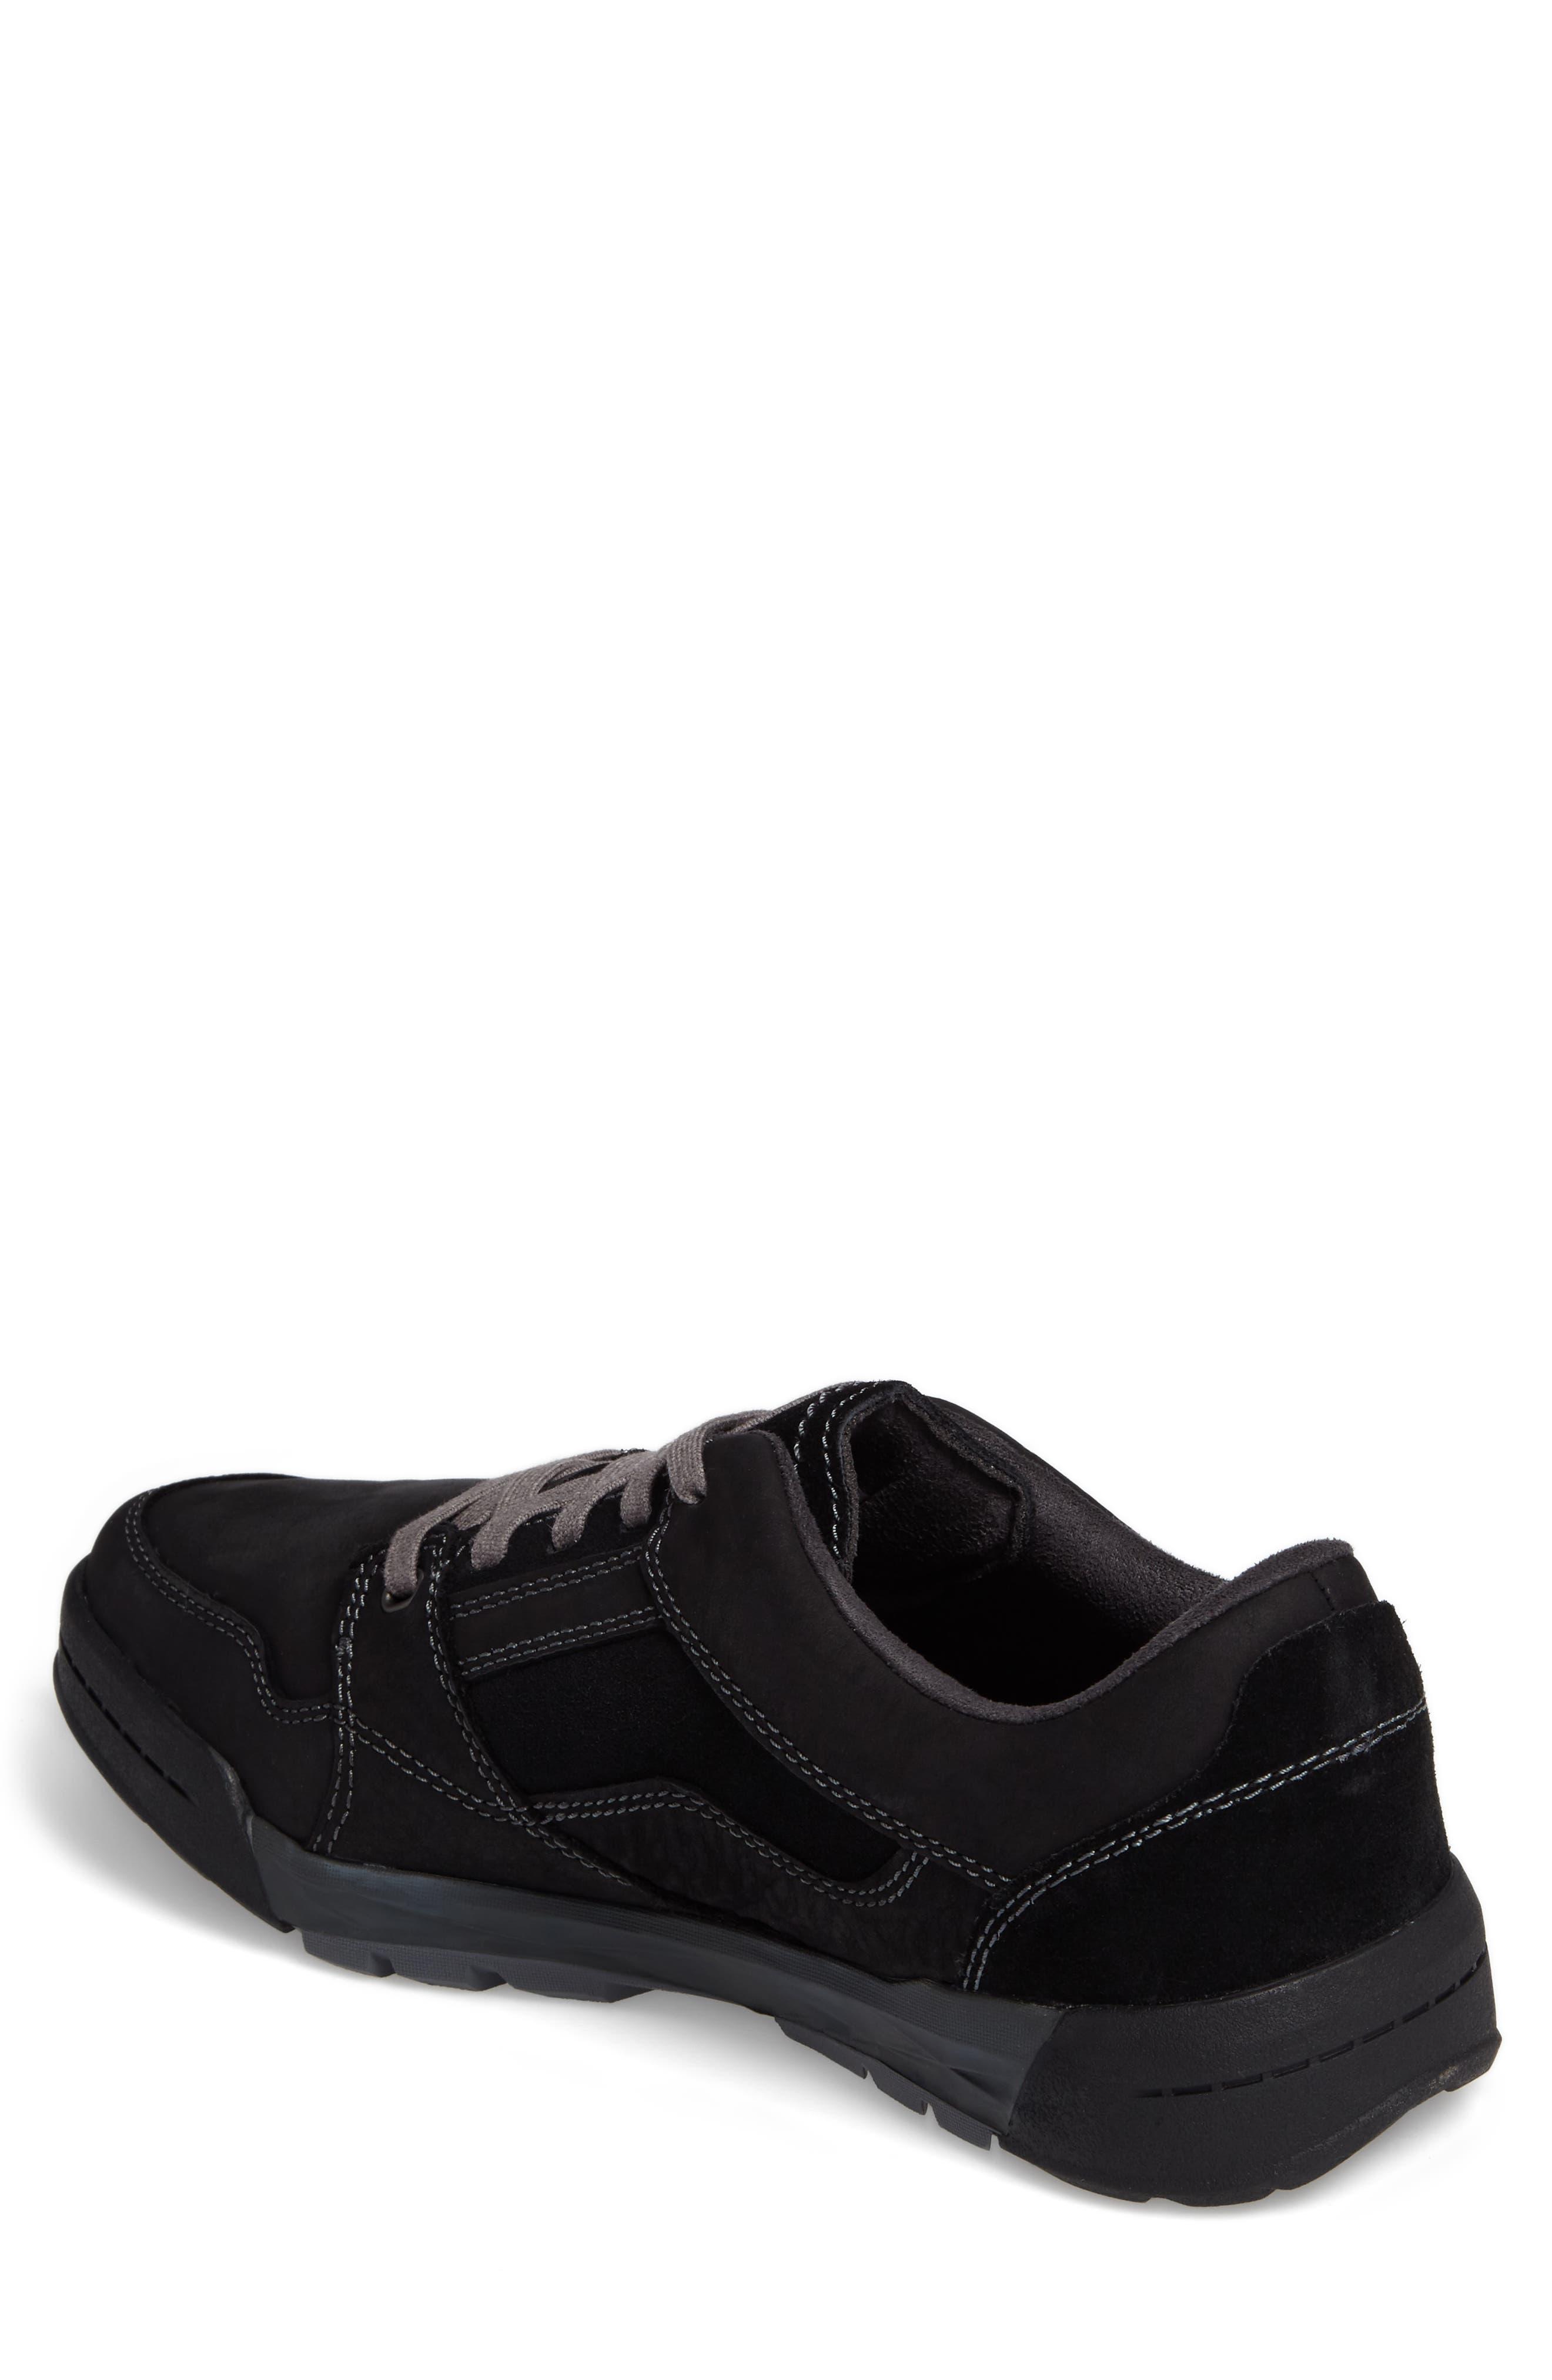 Berner Sneaker,                             Alternate thumbnail 2, color,                             001